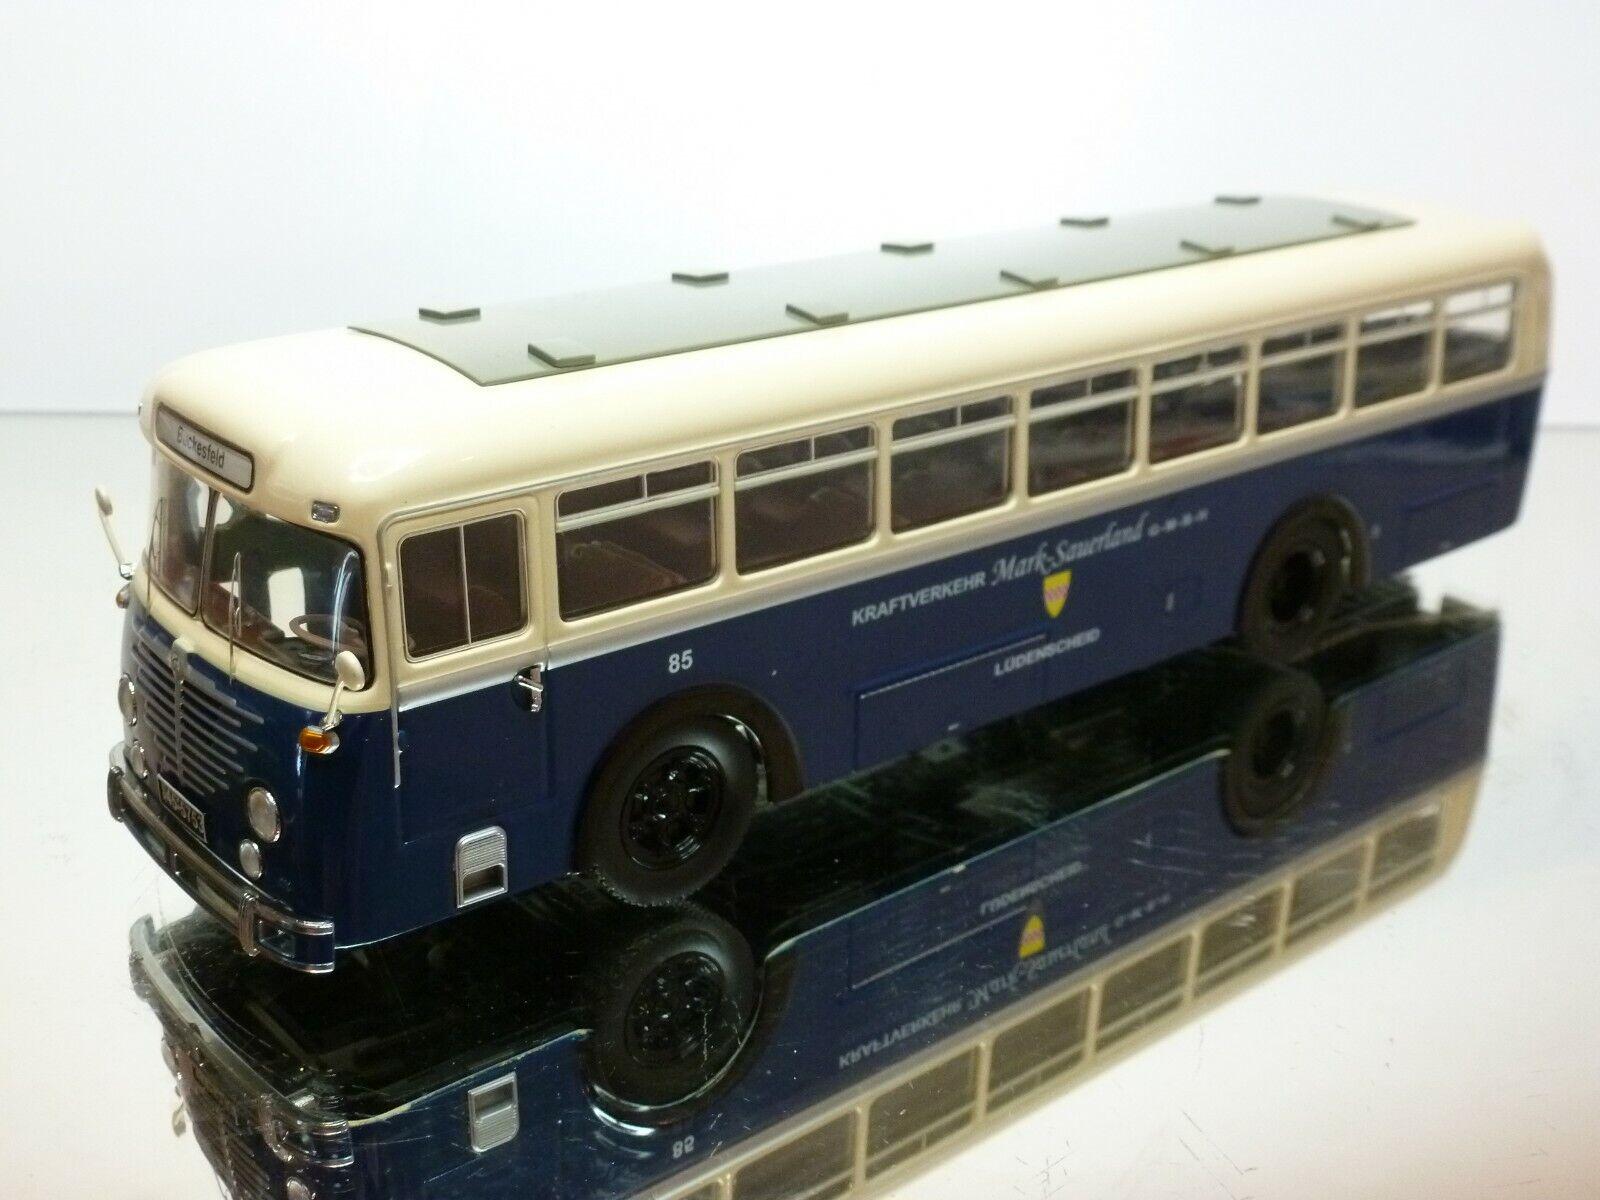 SCHUCO 03472 BÜSSING TRAMBUS 6500T MARK-SAUERLAND - bleu 1 43 - VERY GOOD